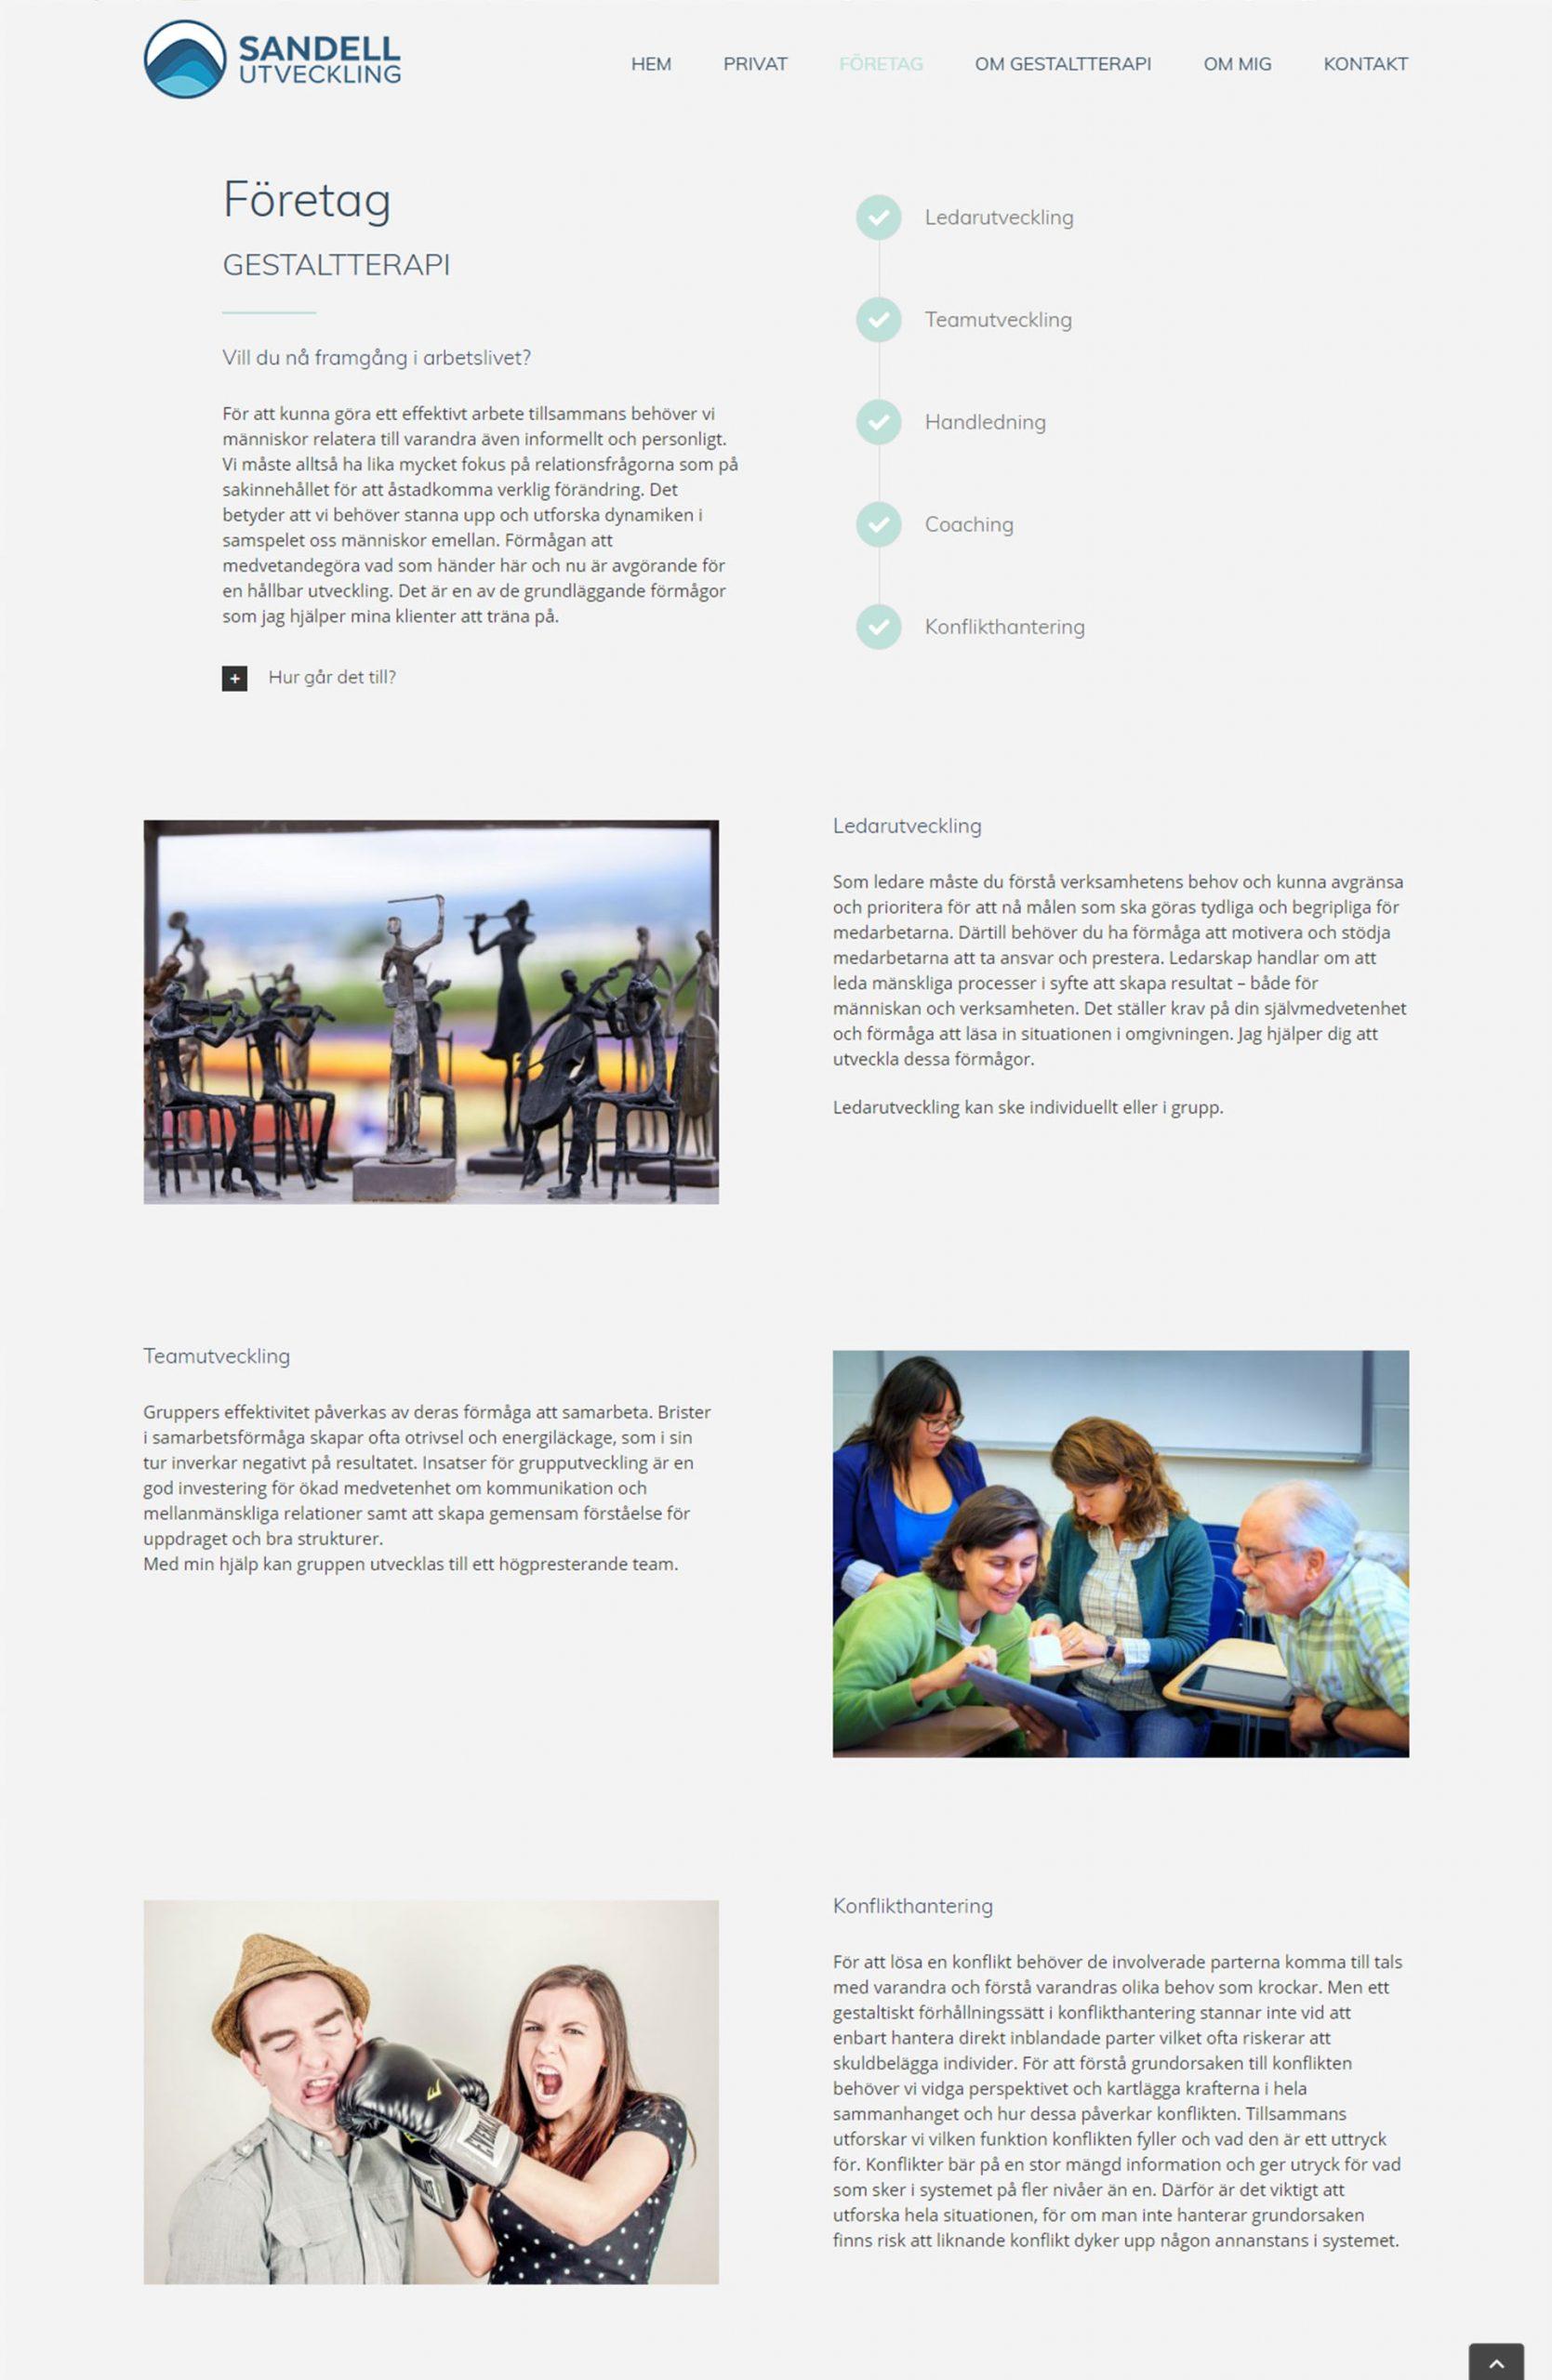 Web Design anweb Sandell Utveckling